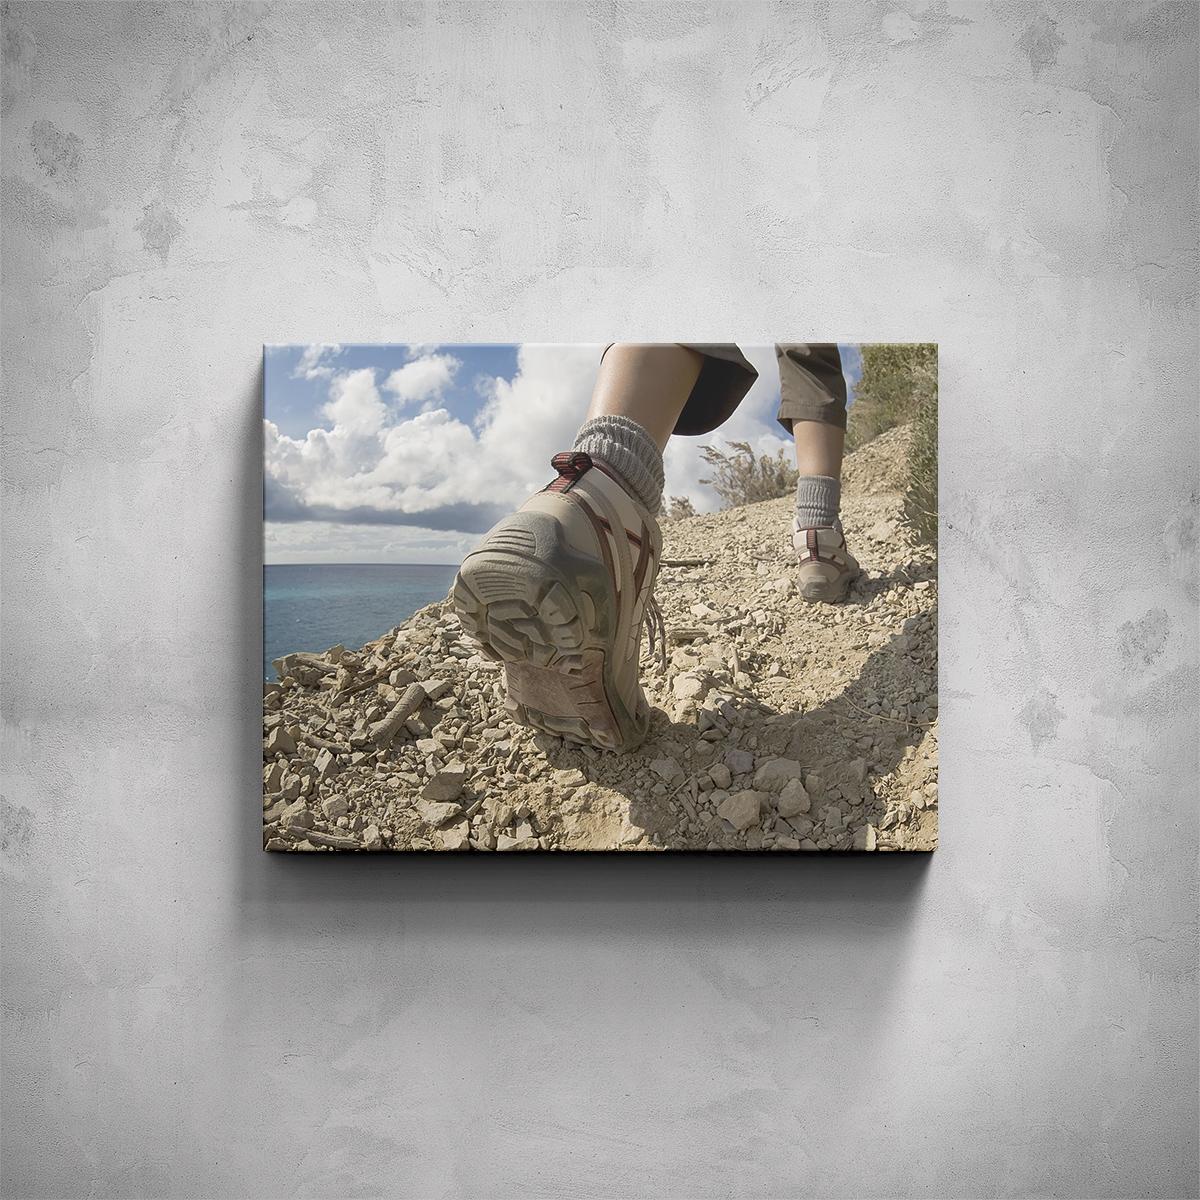 Obraz - Treková obuv - PopyDesign